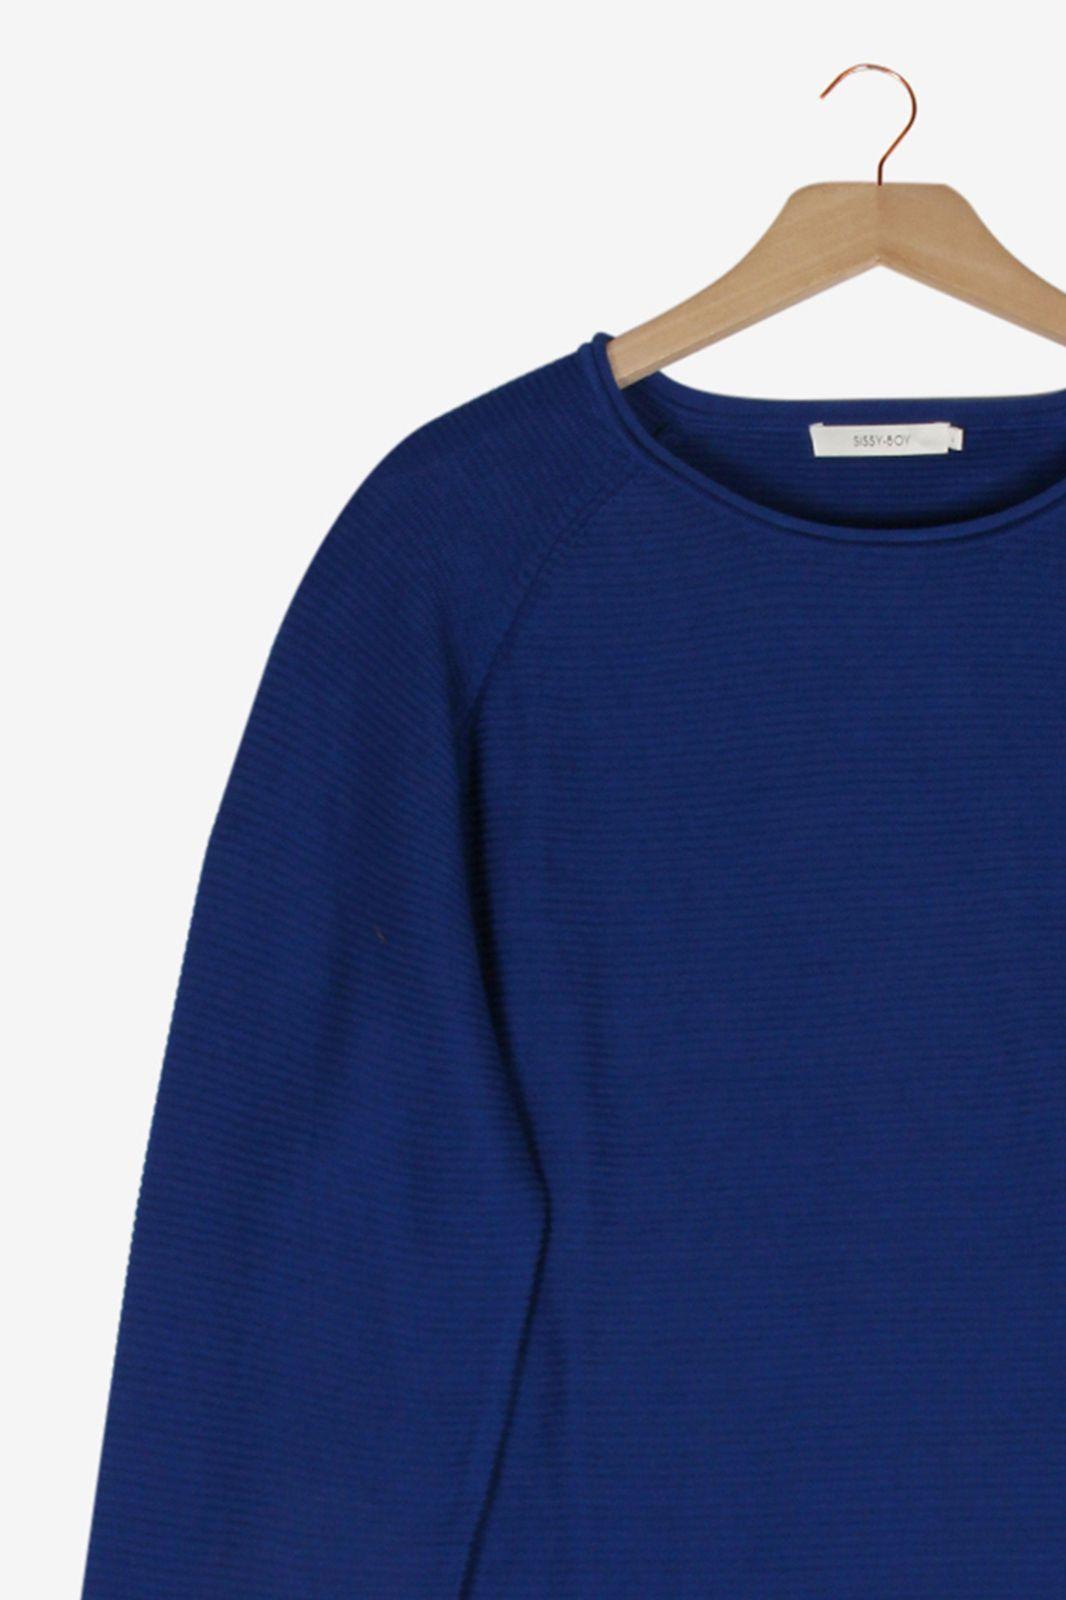 Marineblauwe rib knit trui - Heren | Sissy-Boy